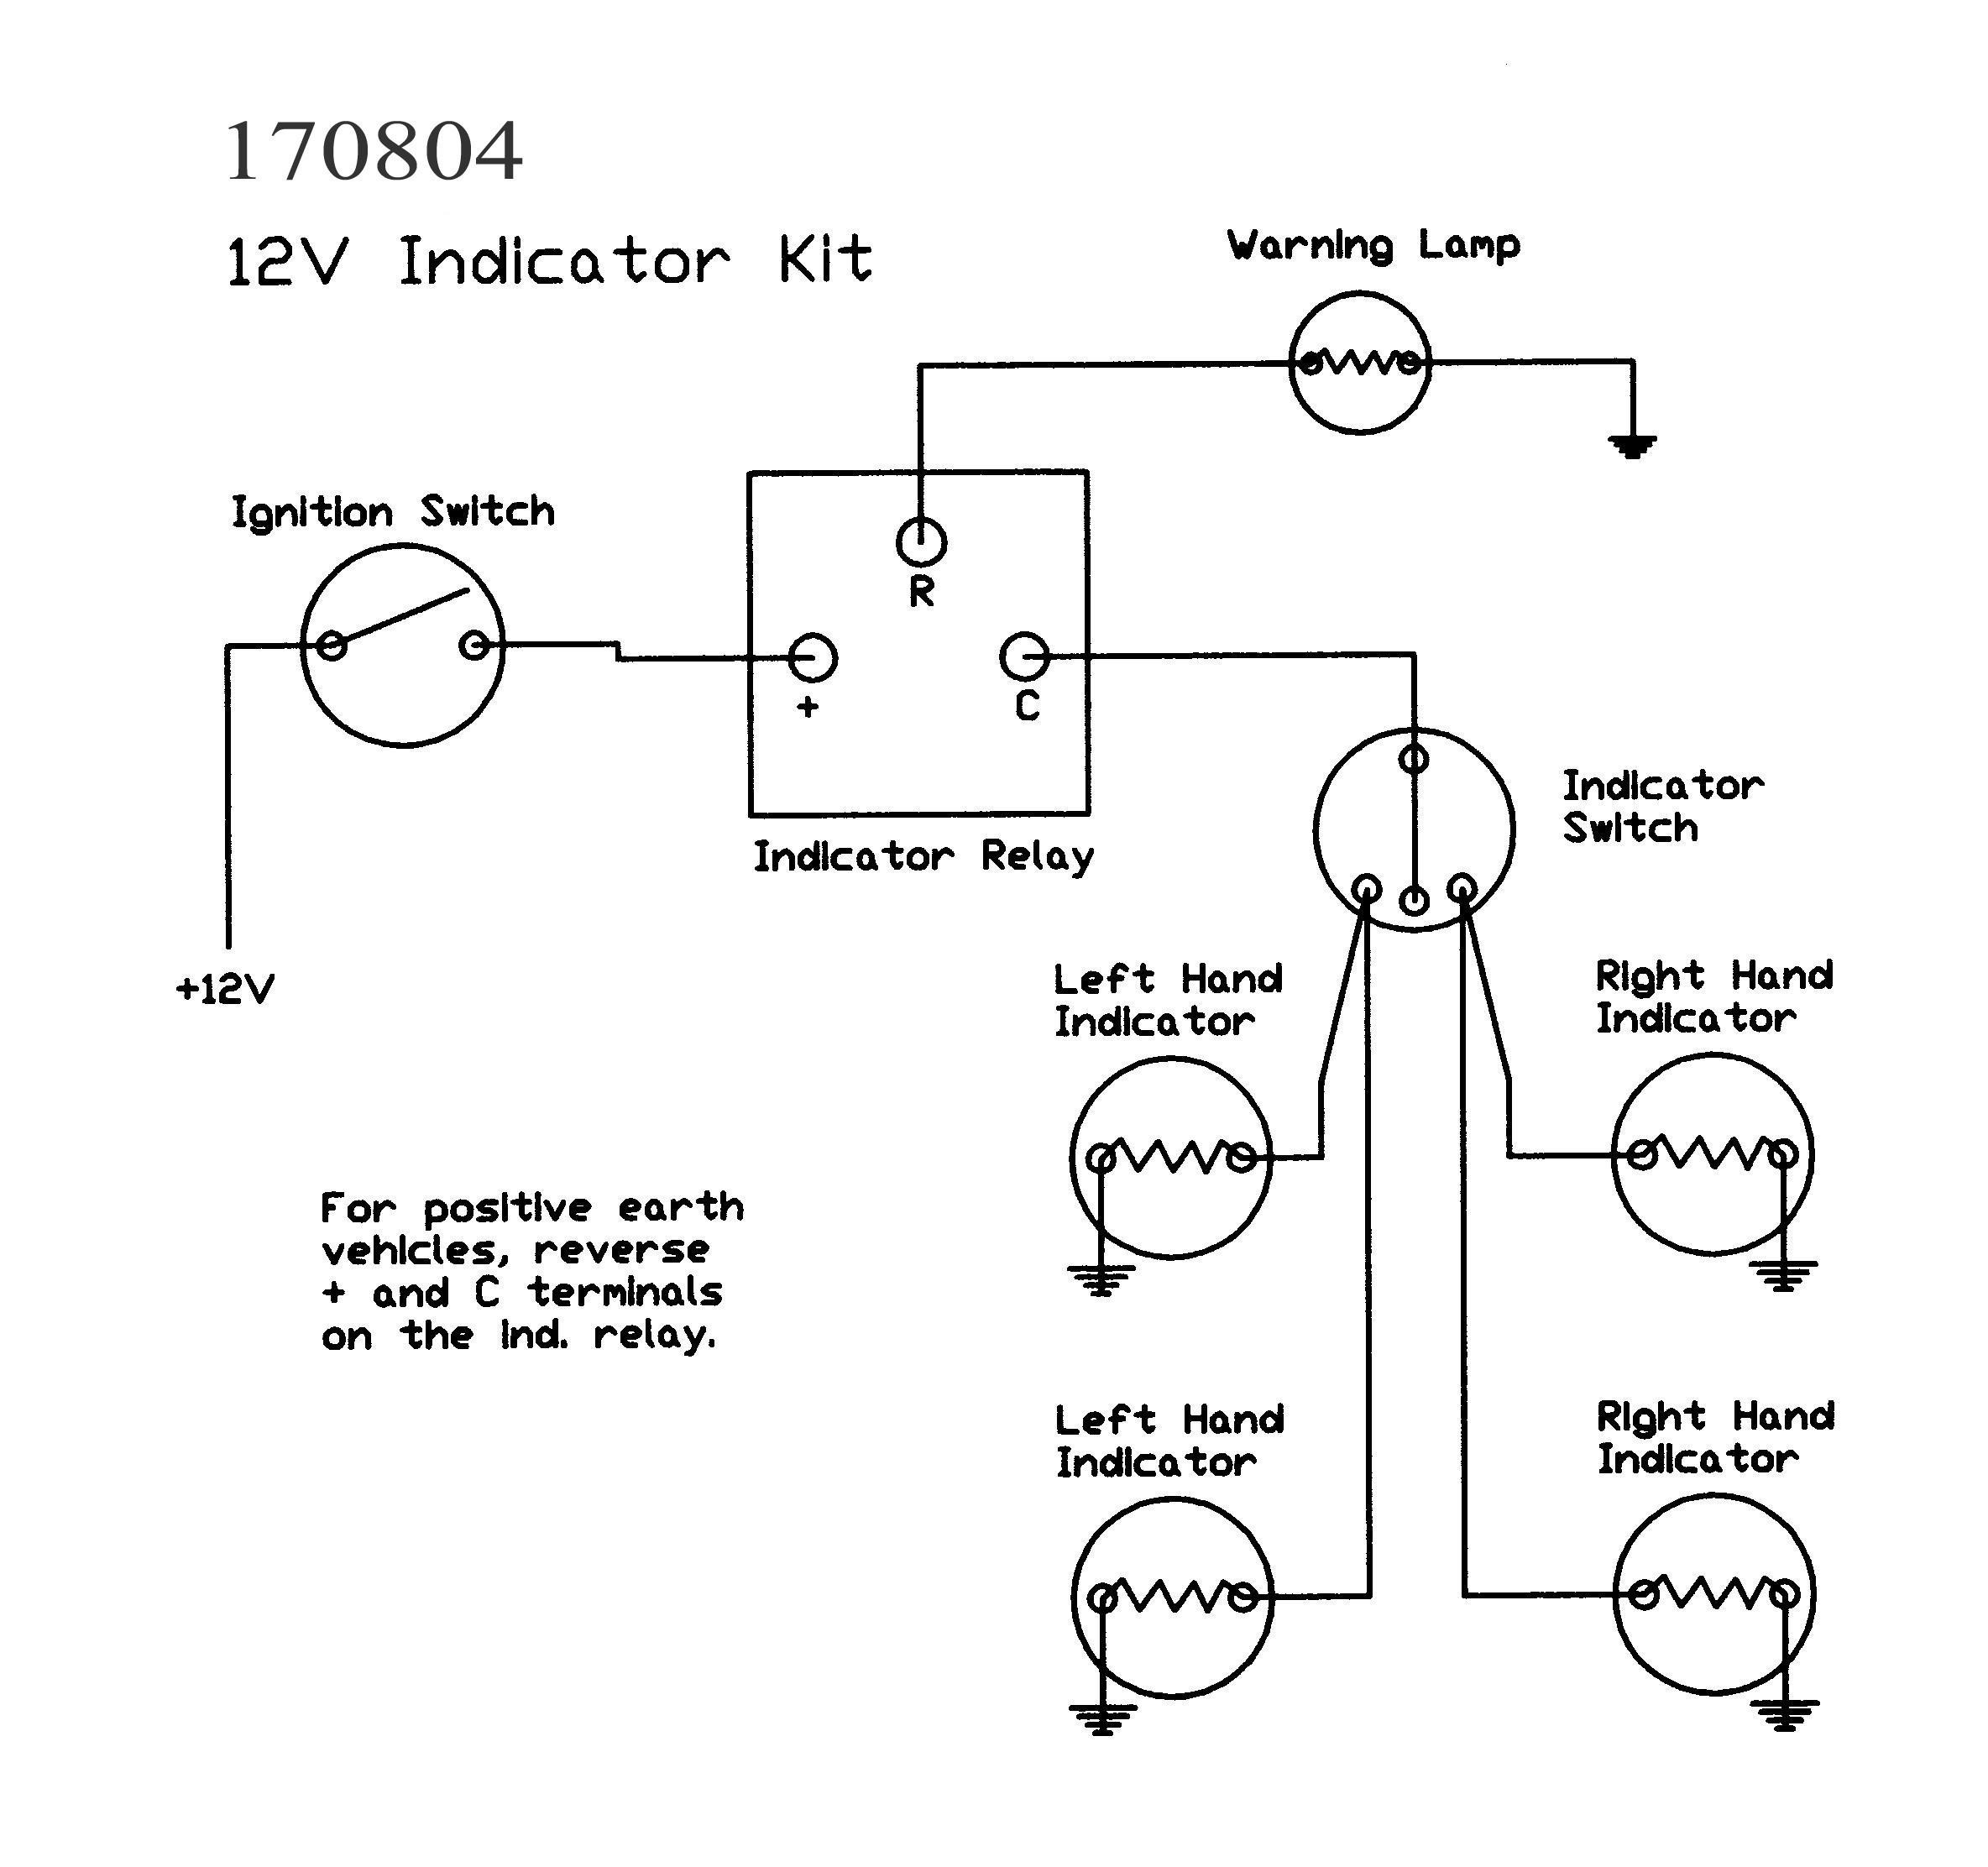 Diagram 3 Pin Flasher Unit Wiring Diagram Full Version Hd Quality Wiring Diagram Diagramleahx Operepieriunite It